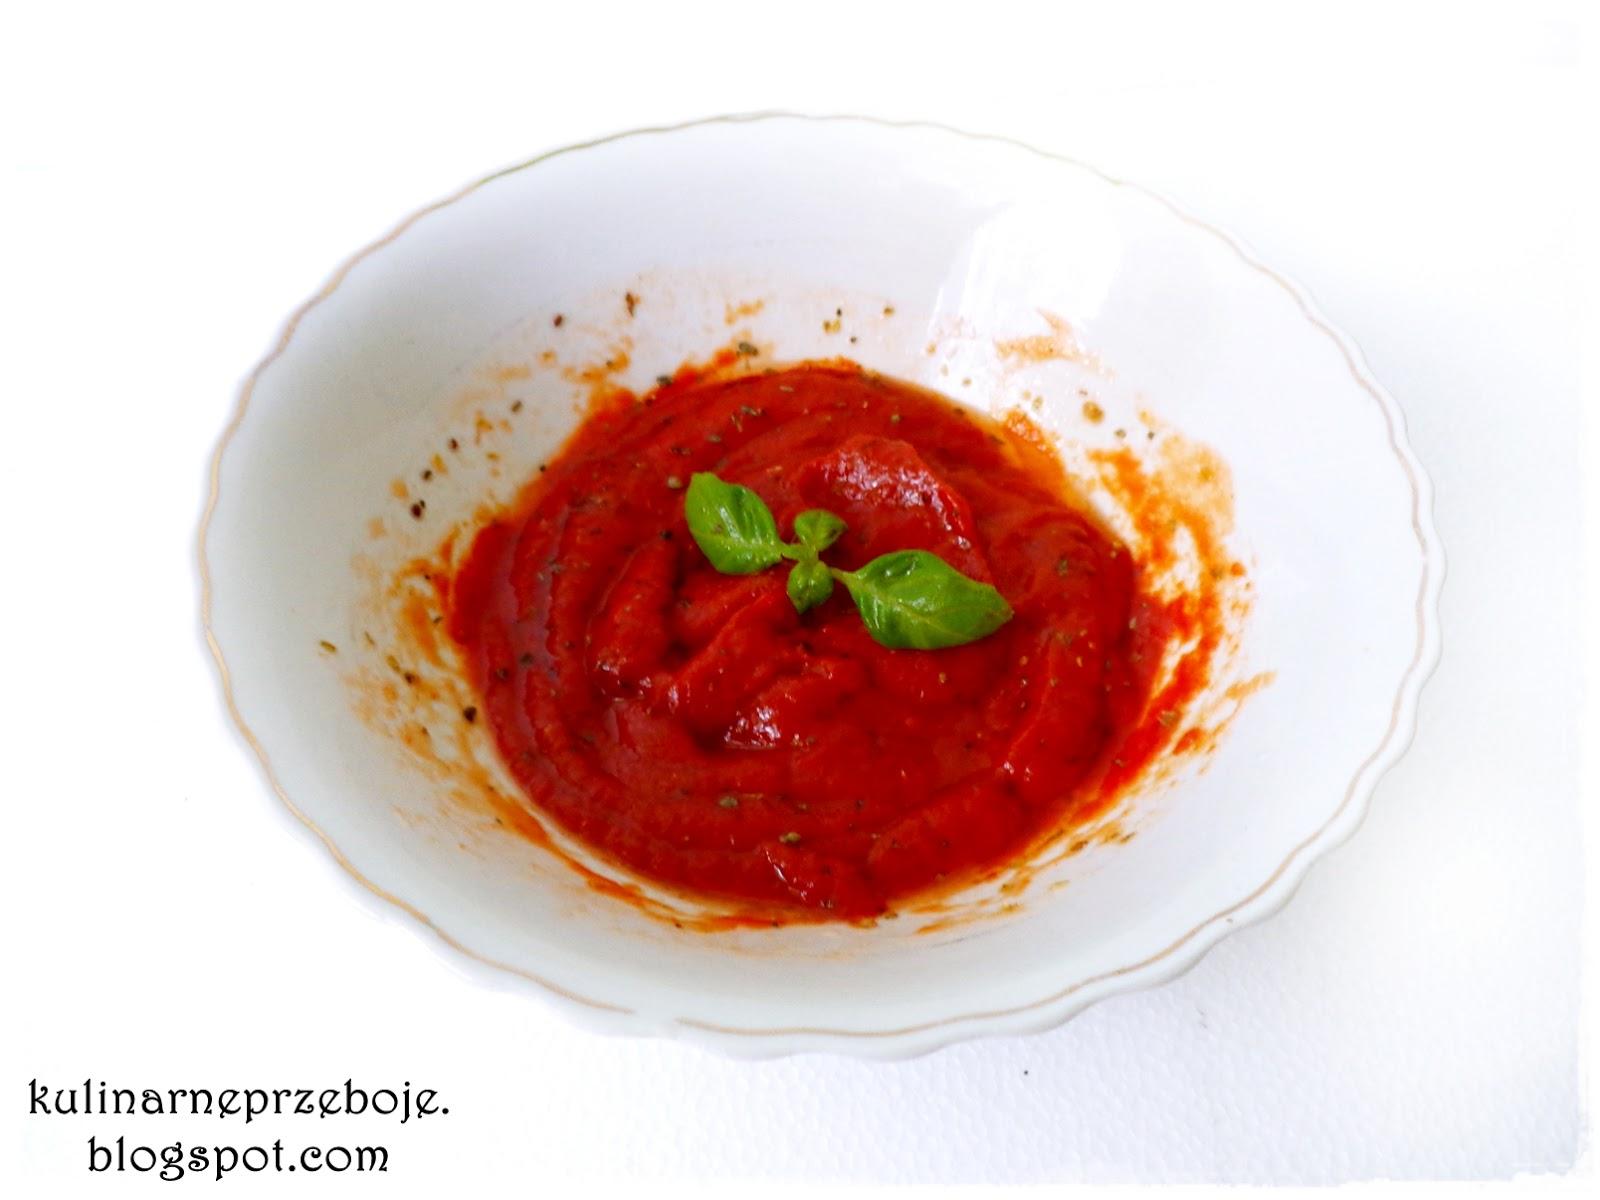 Sos do pizzy - sos pomidorowy, Pizza Sauce - Tomatensauce